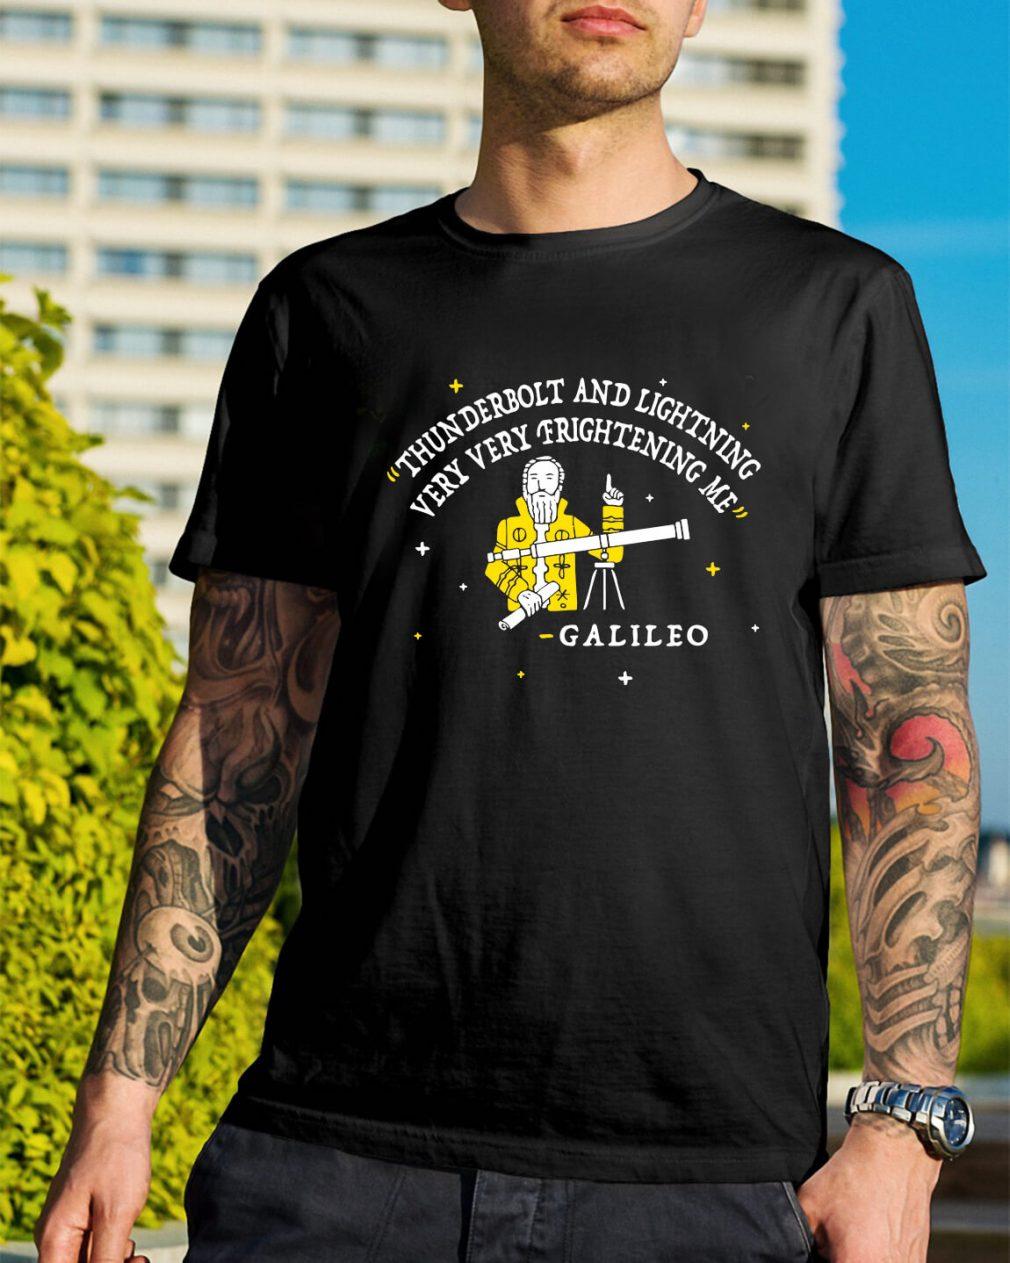 Thunderbolt and lightning very very frightening me Galileo shirt